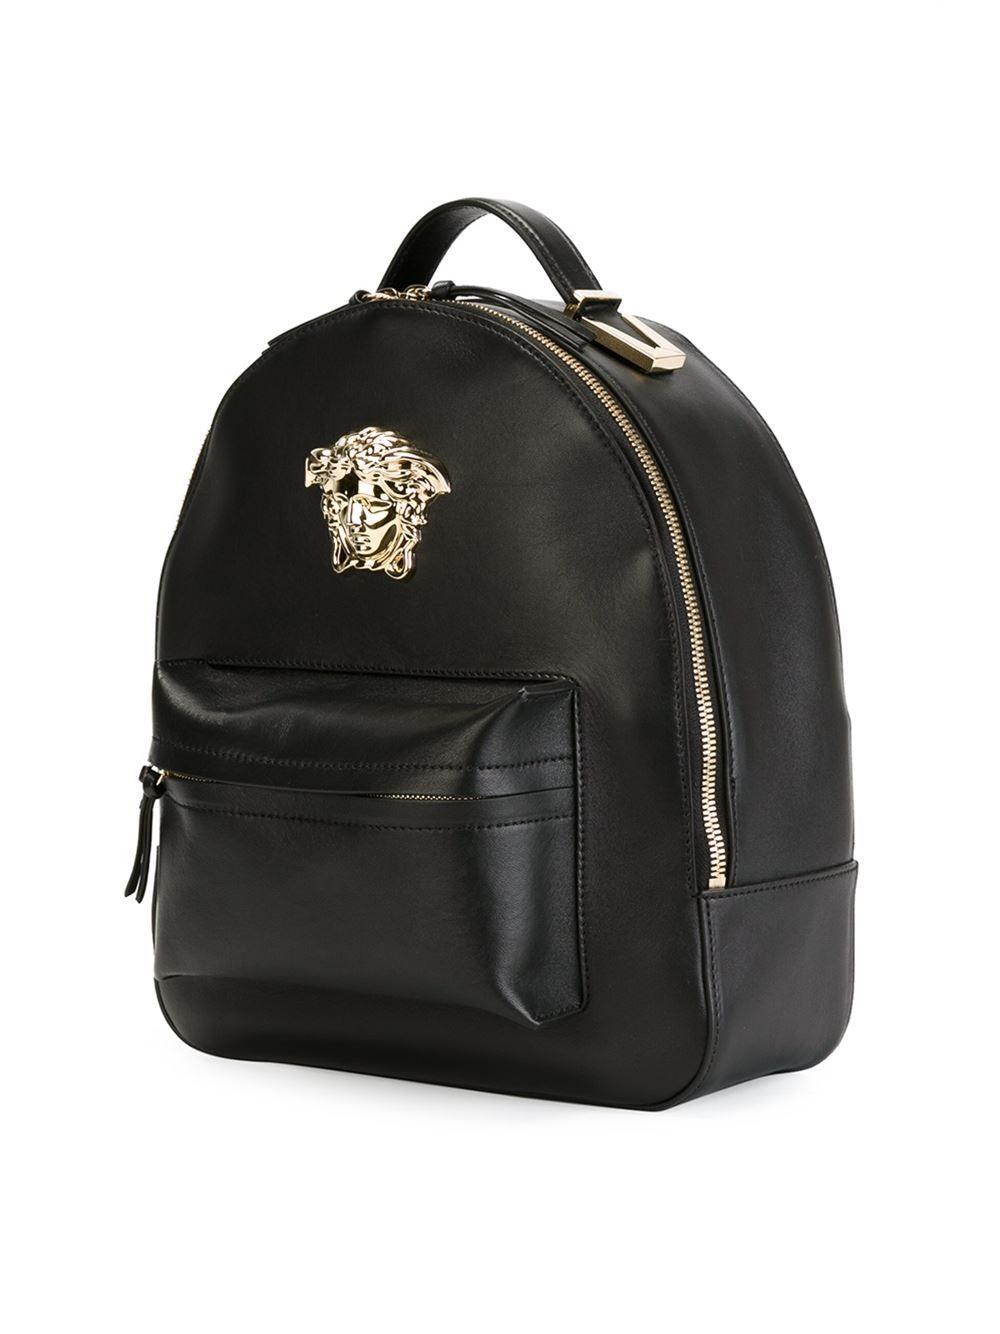 03173acf4a Versace Mochila de couro